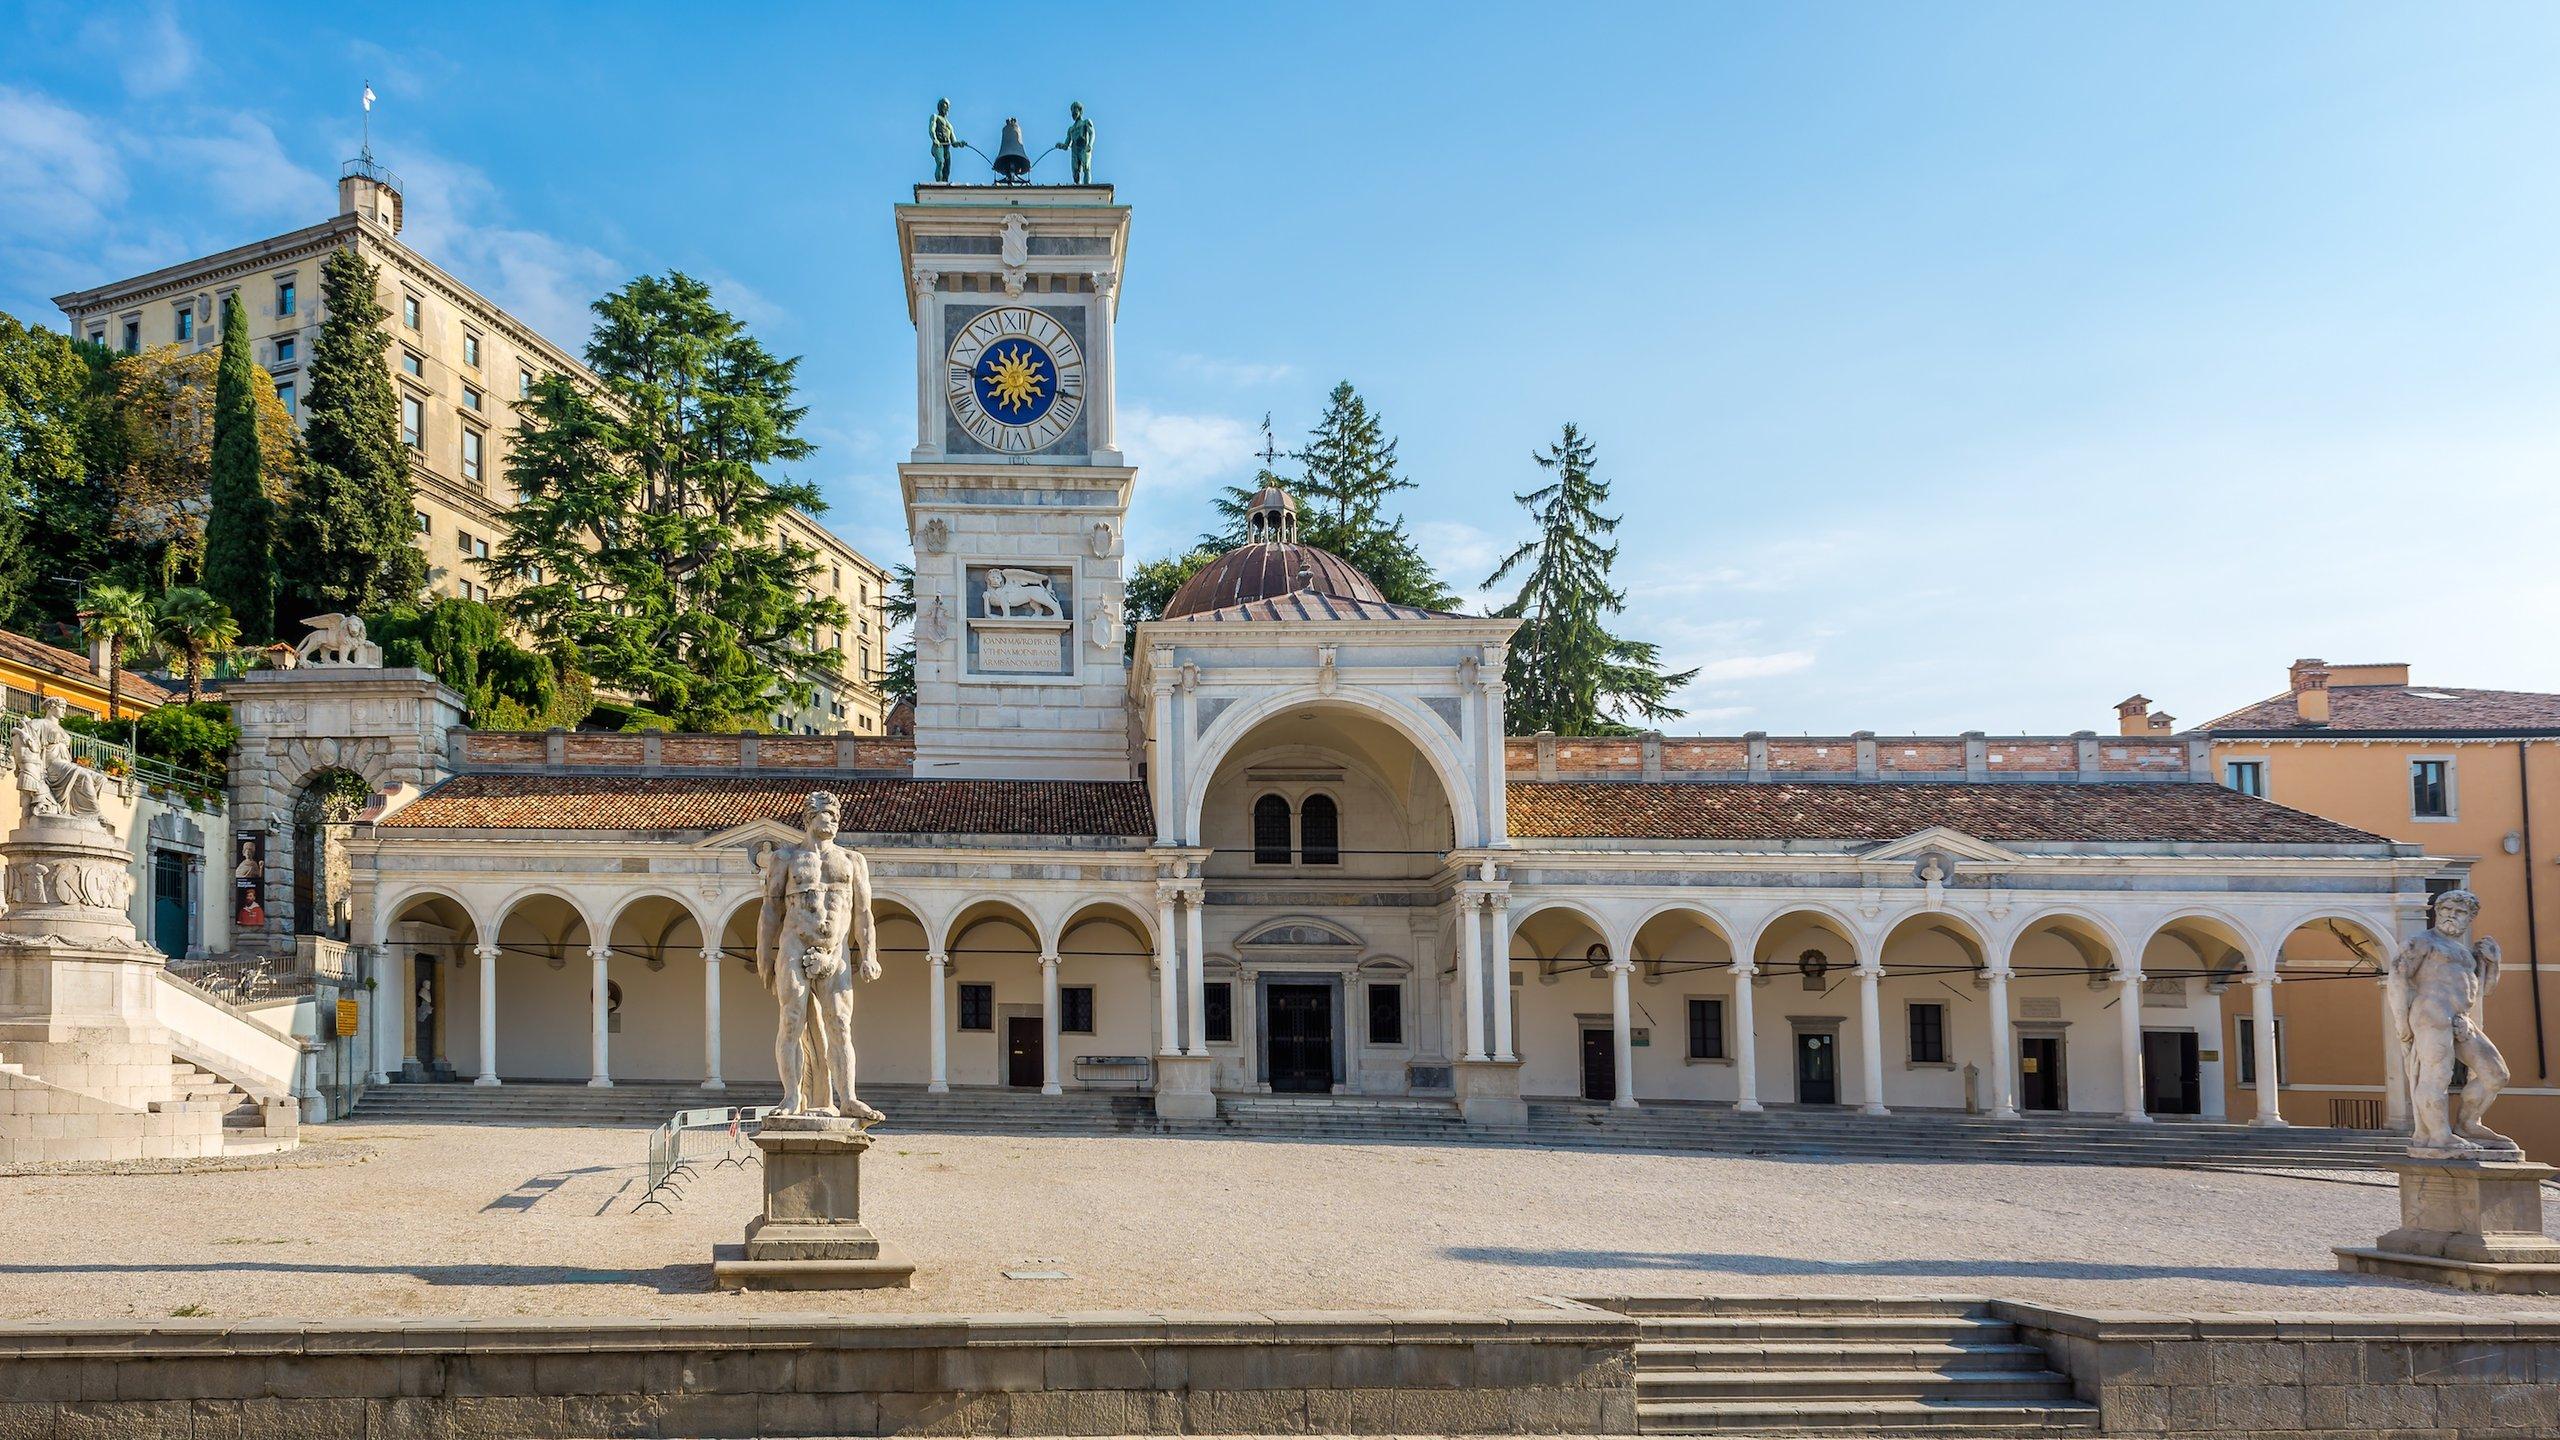 Province of Udine, Friuli Venezia Giulia, Italy